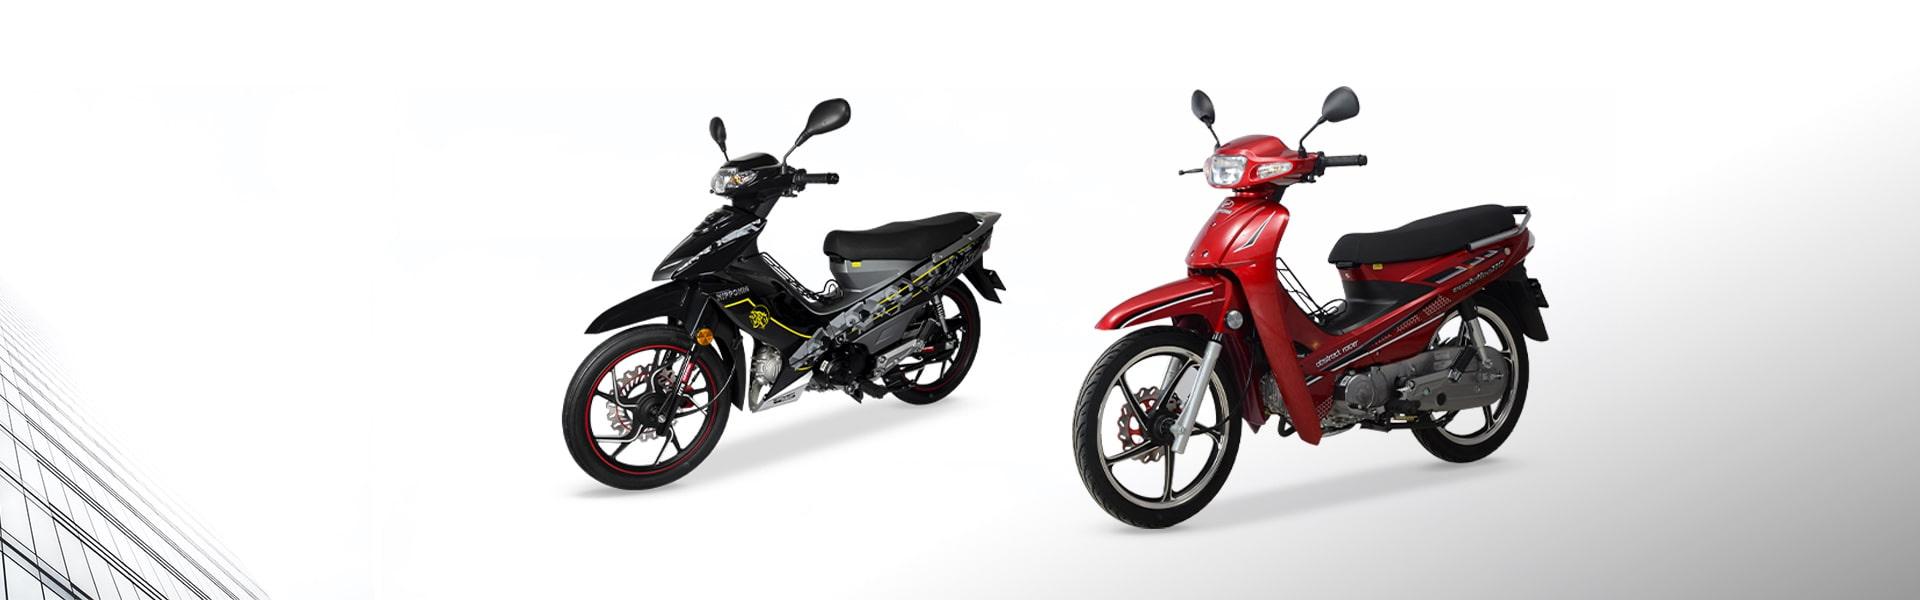 Nipponia Motocicletas de Tipo Cub